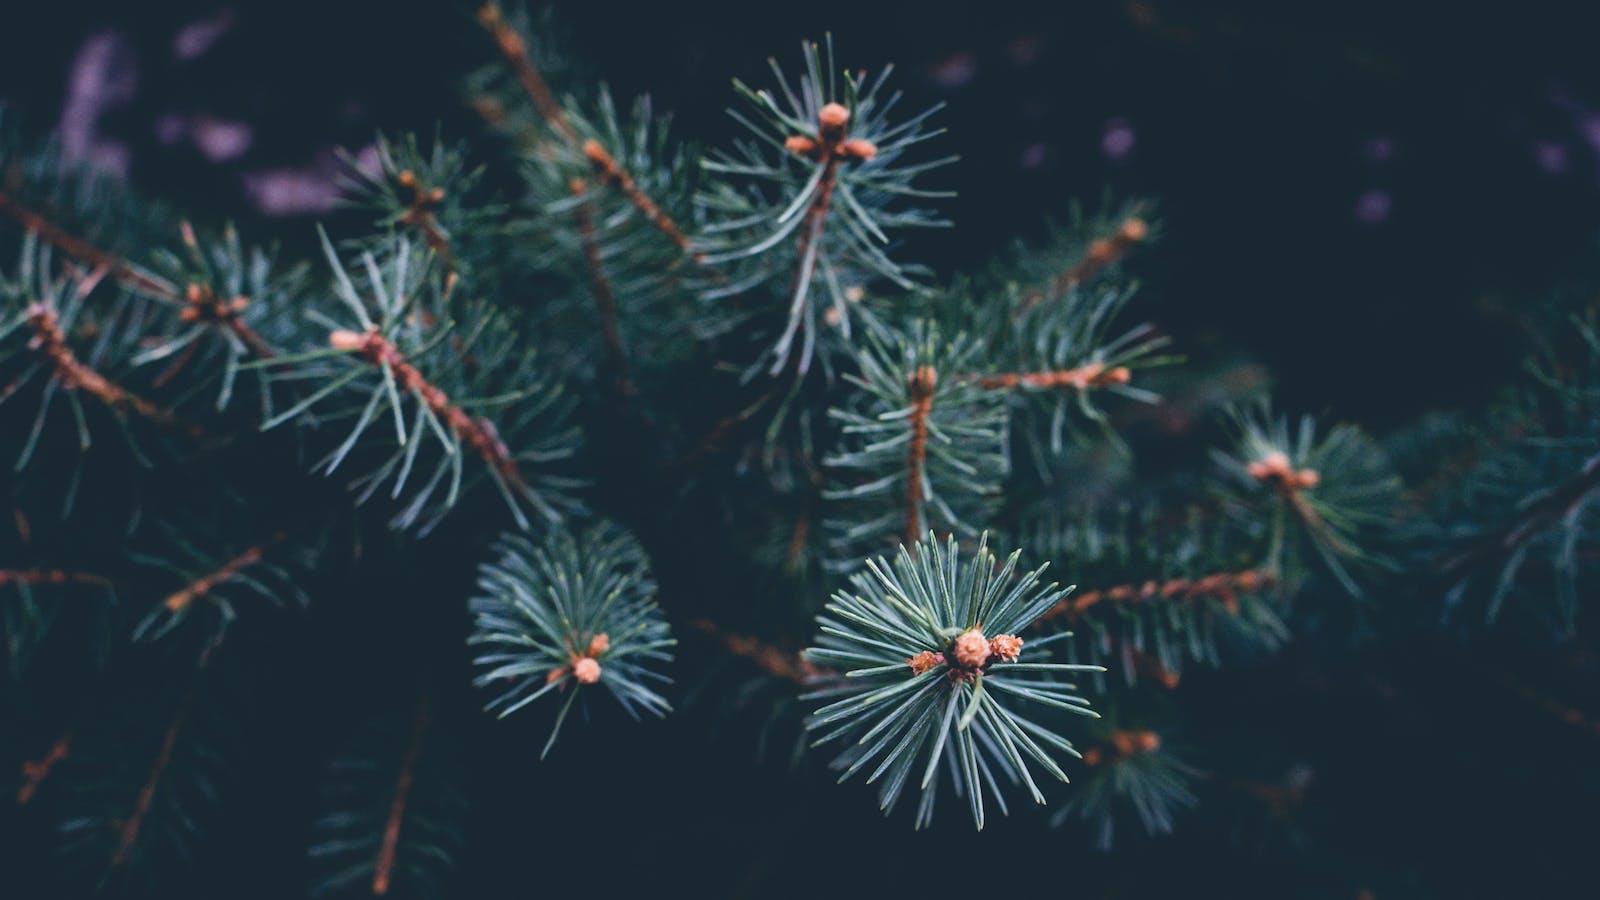 Wrap Joy for Under the Tree